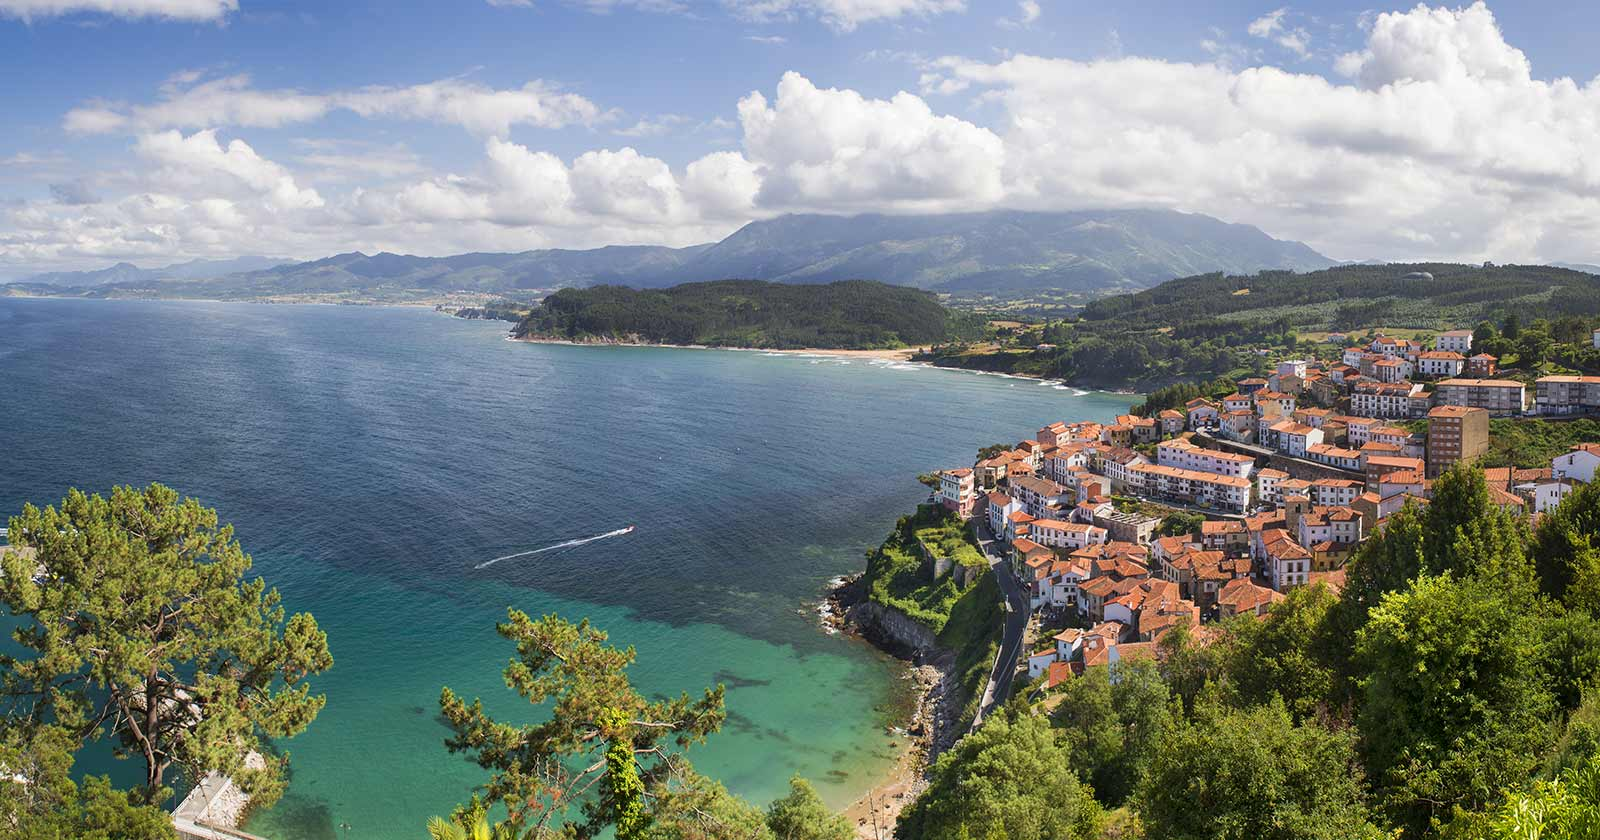 Asturias qu ver y gu a de viaje de asturias viajes el corte ingl s - Ofertas asturias ...